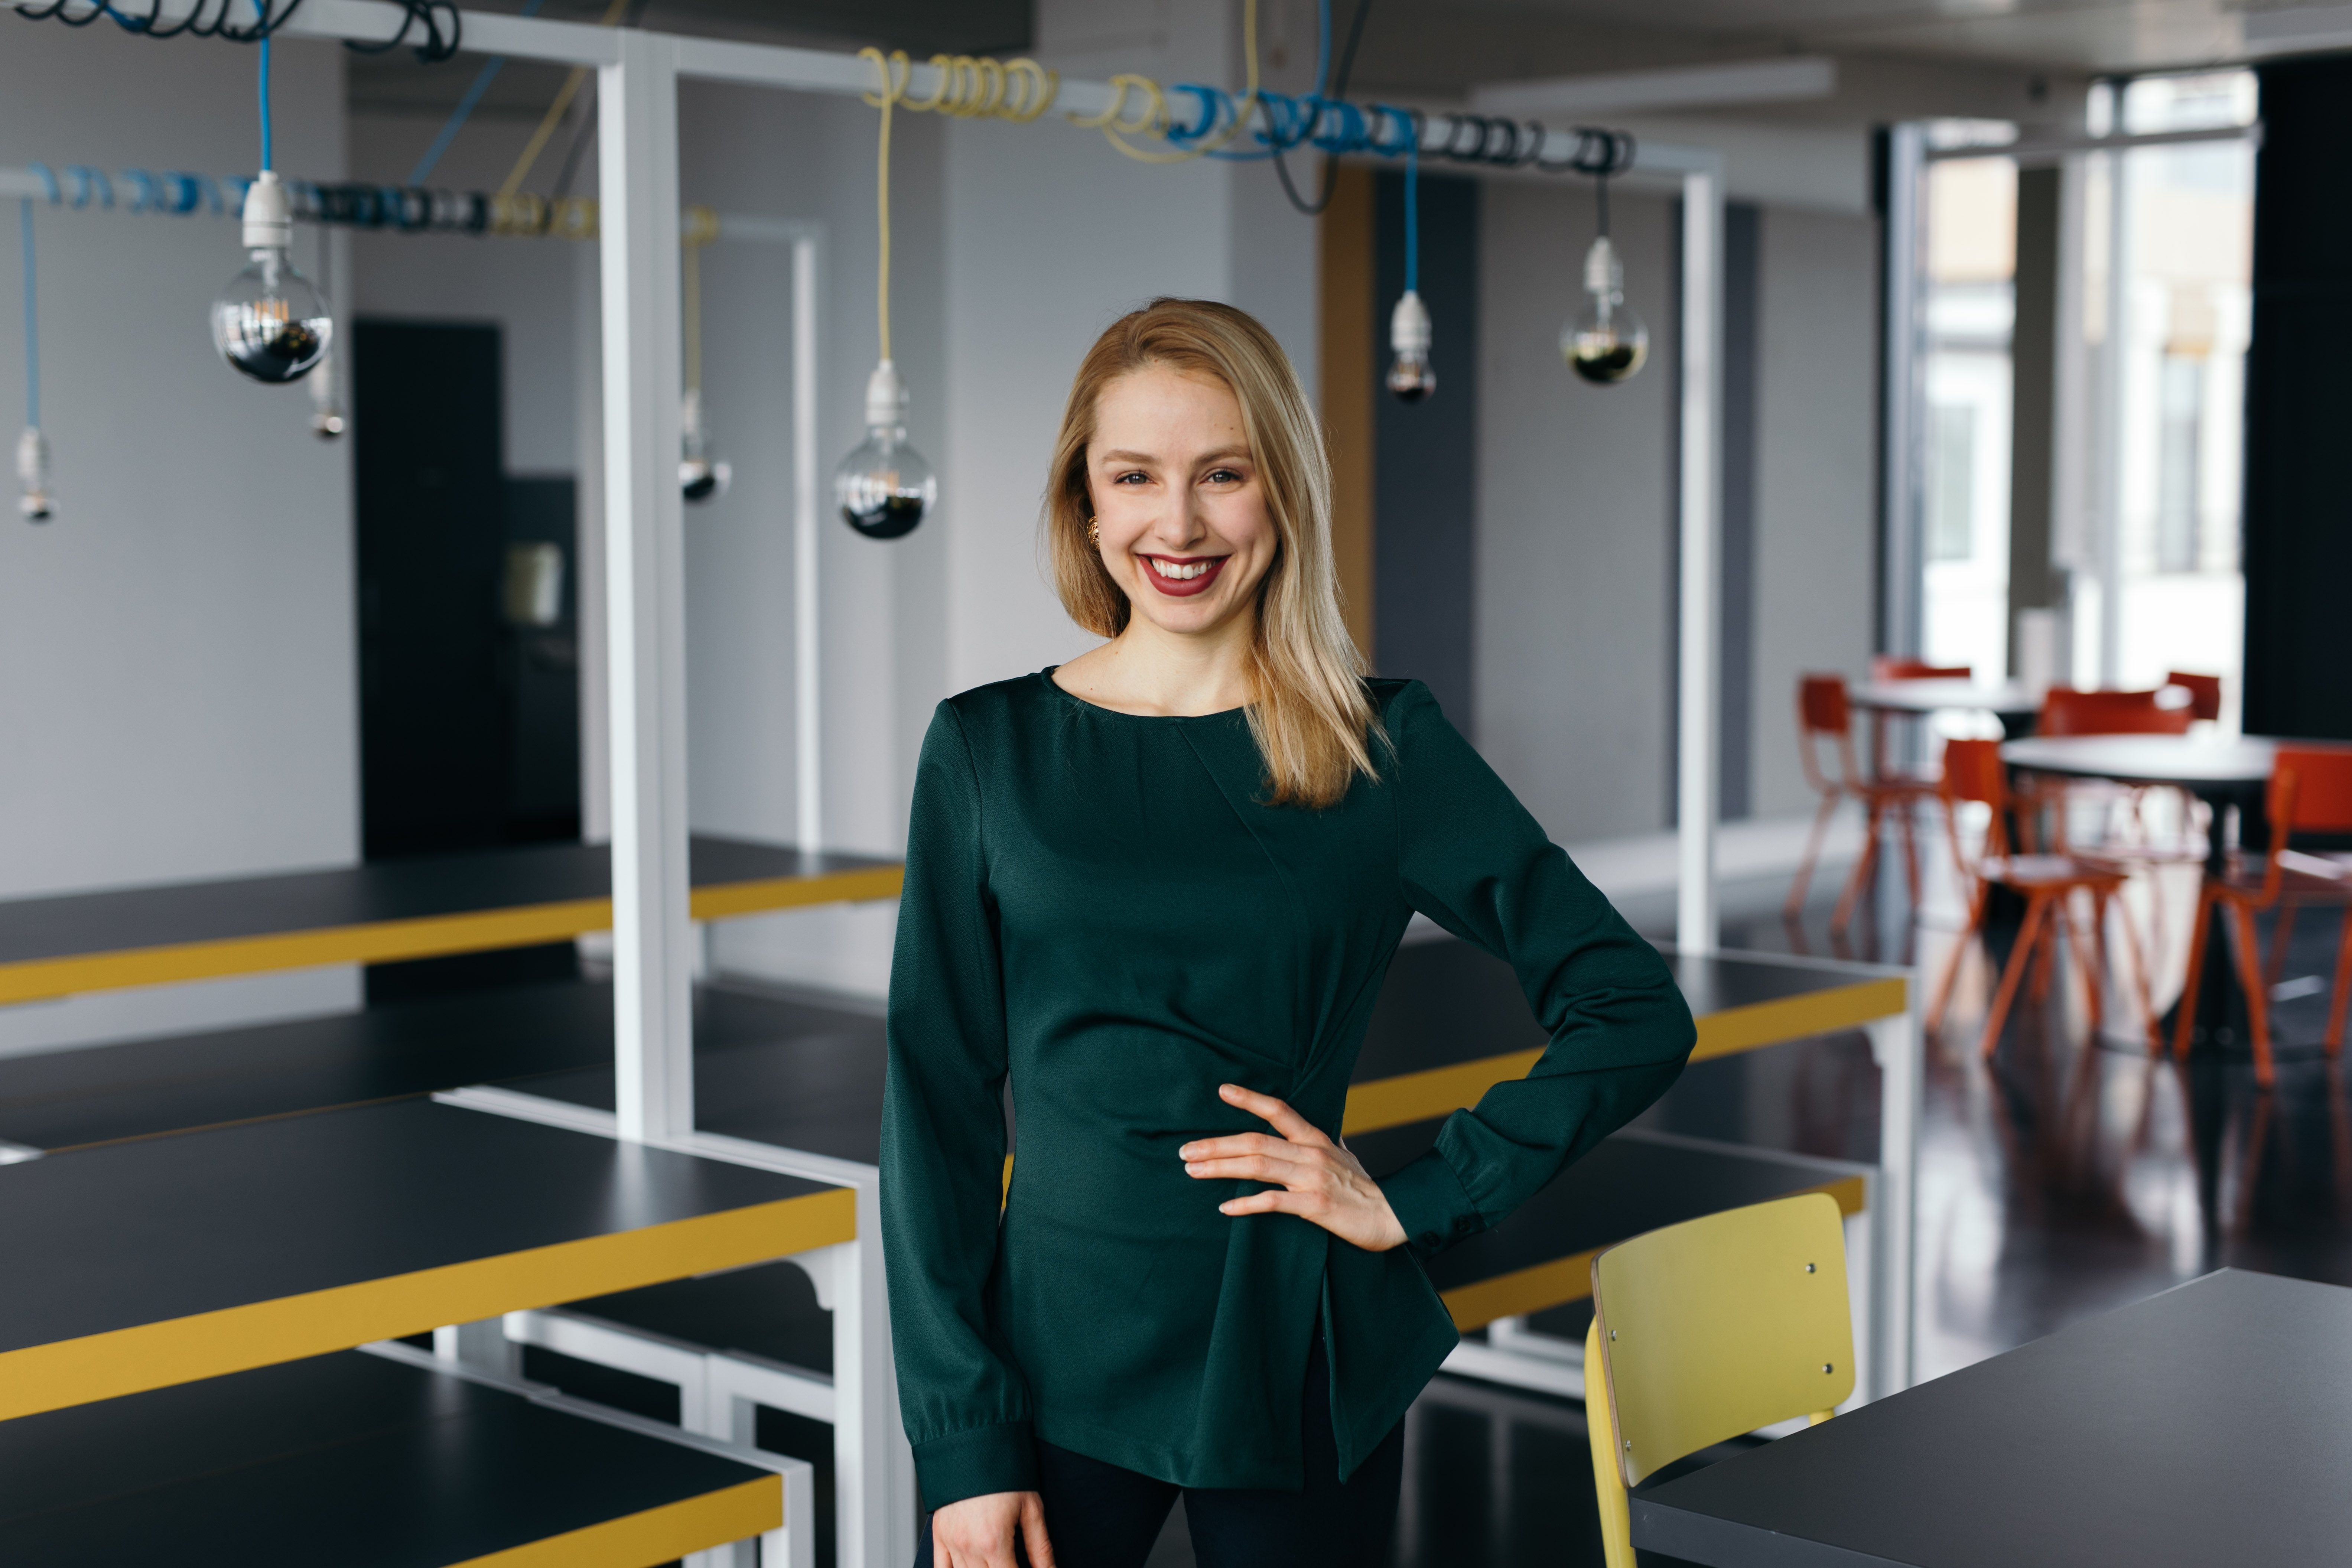 Sara Tortoli Hacker Noon profile picture